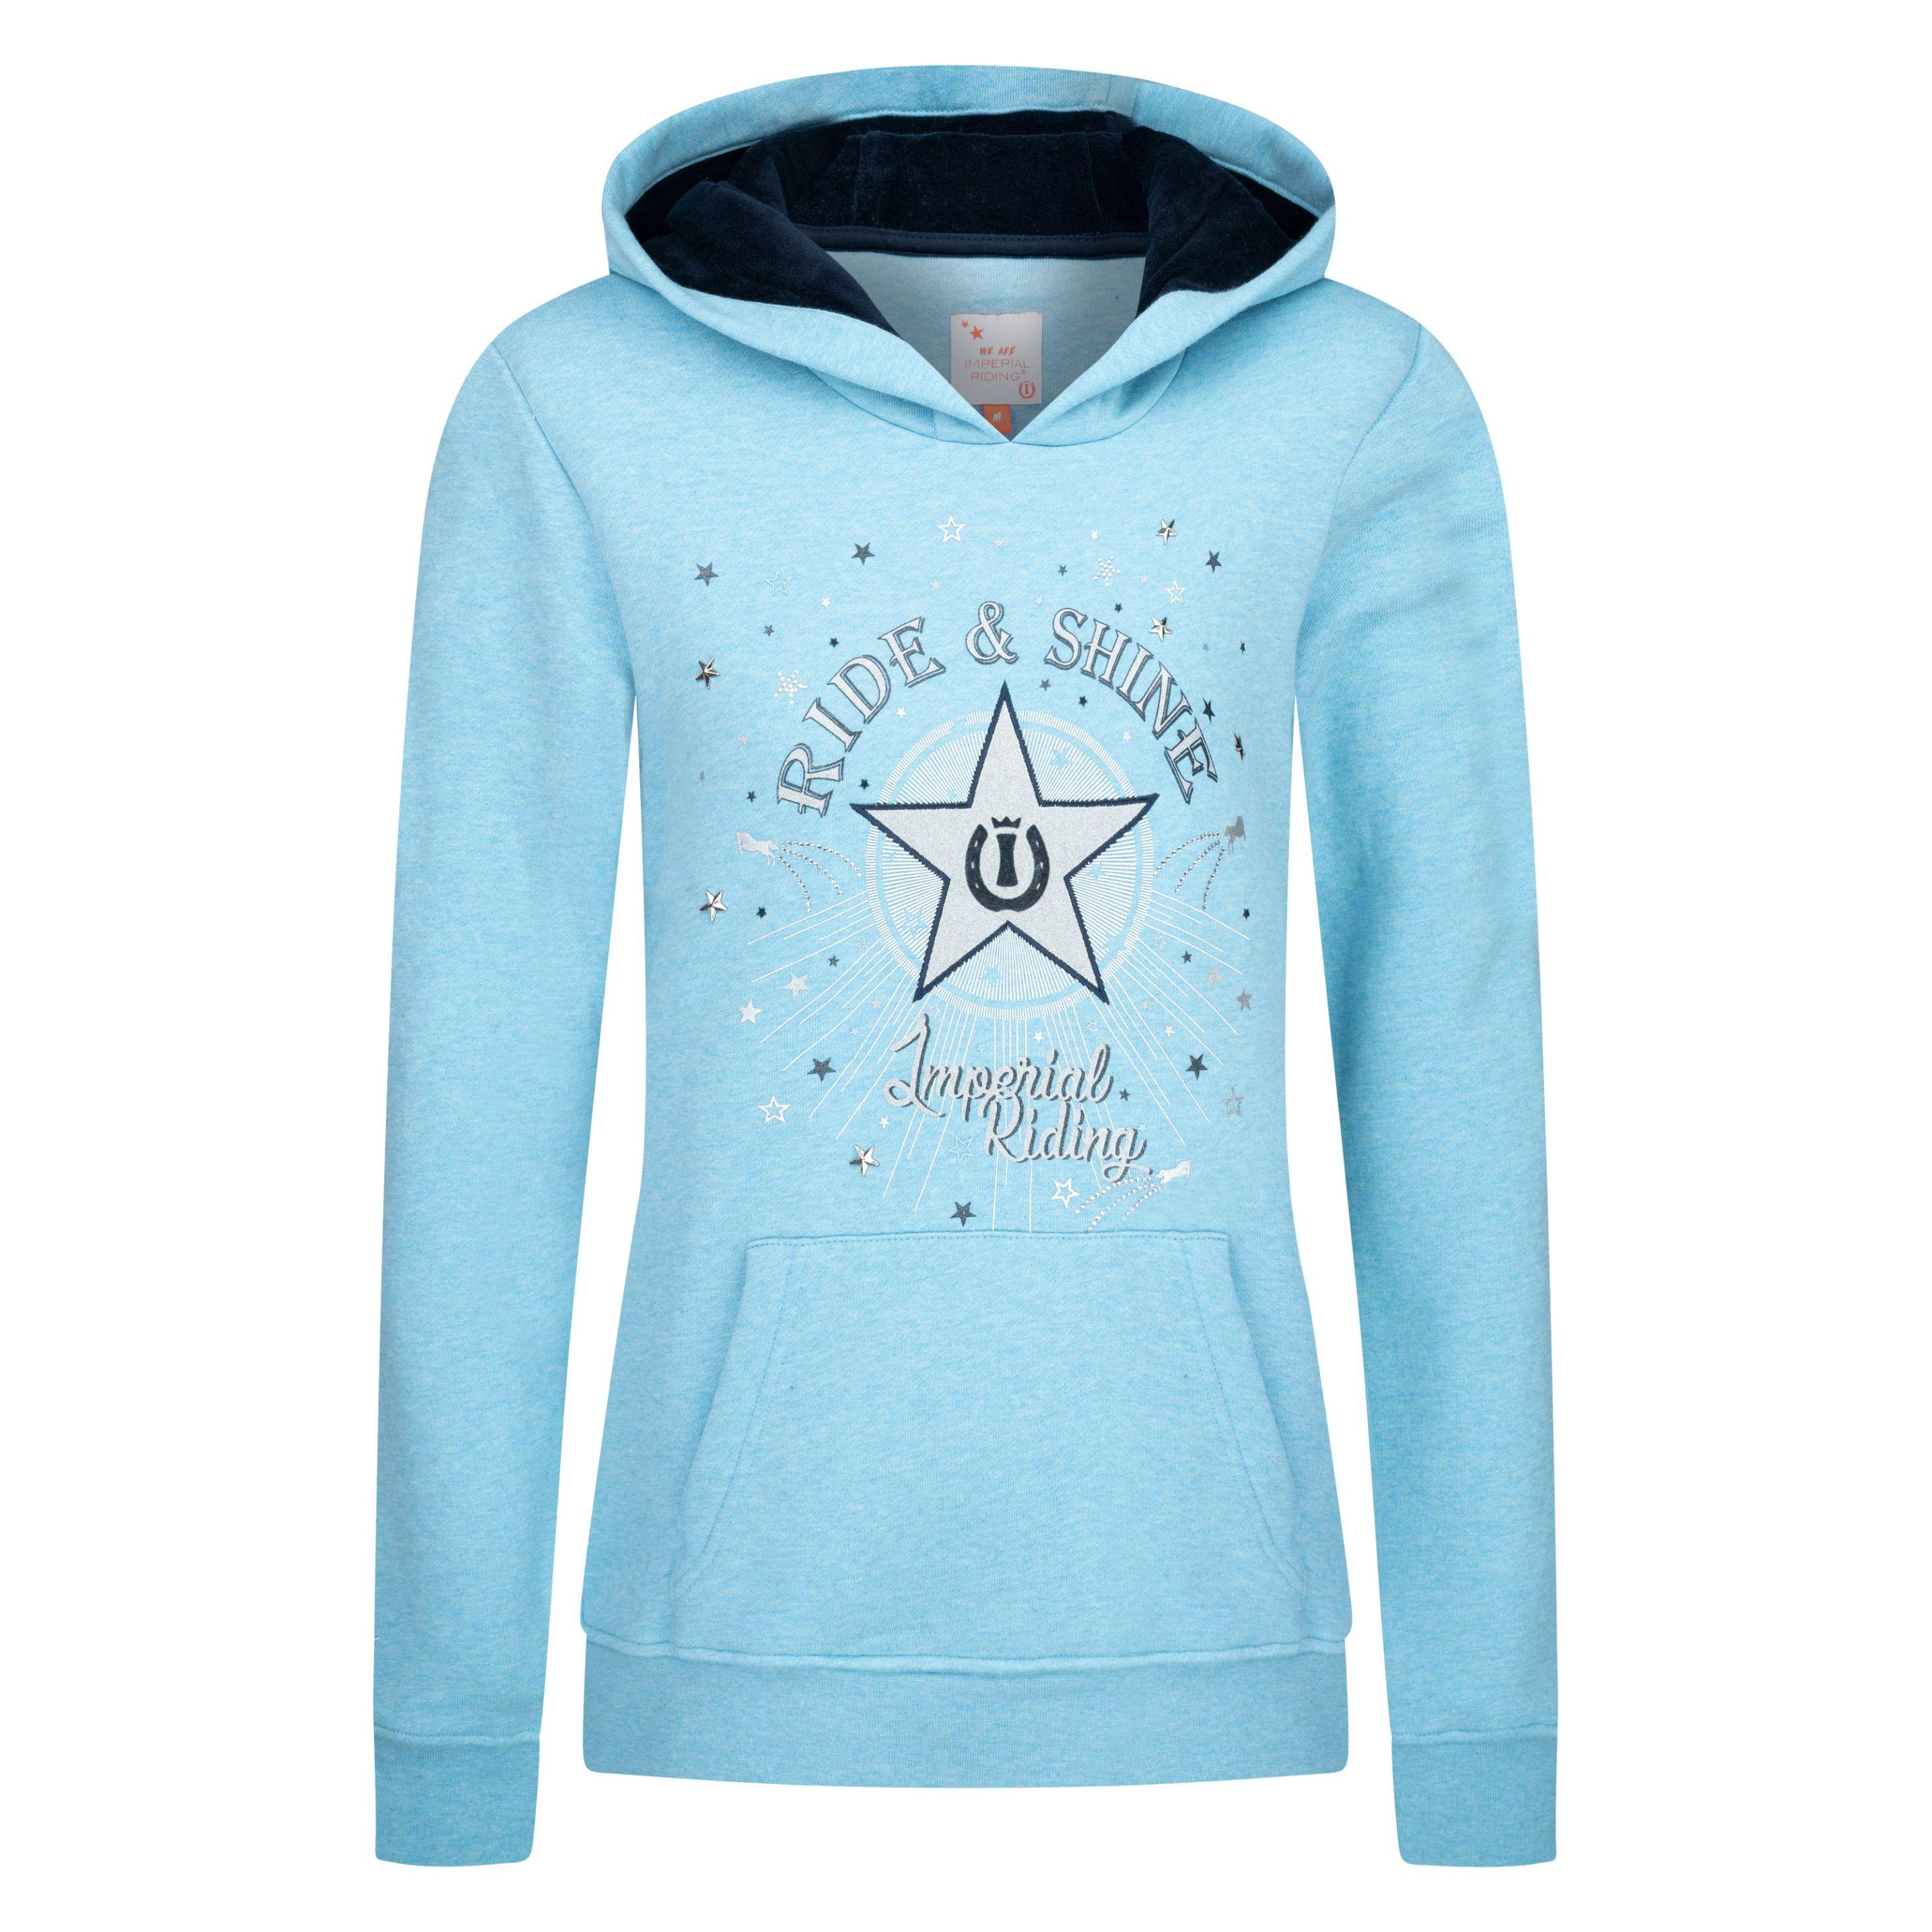 Imperial Riding sweater met capuchon IRH-'star shine'